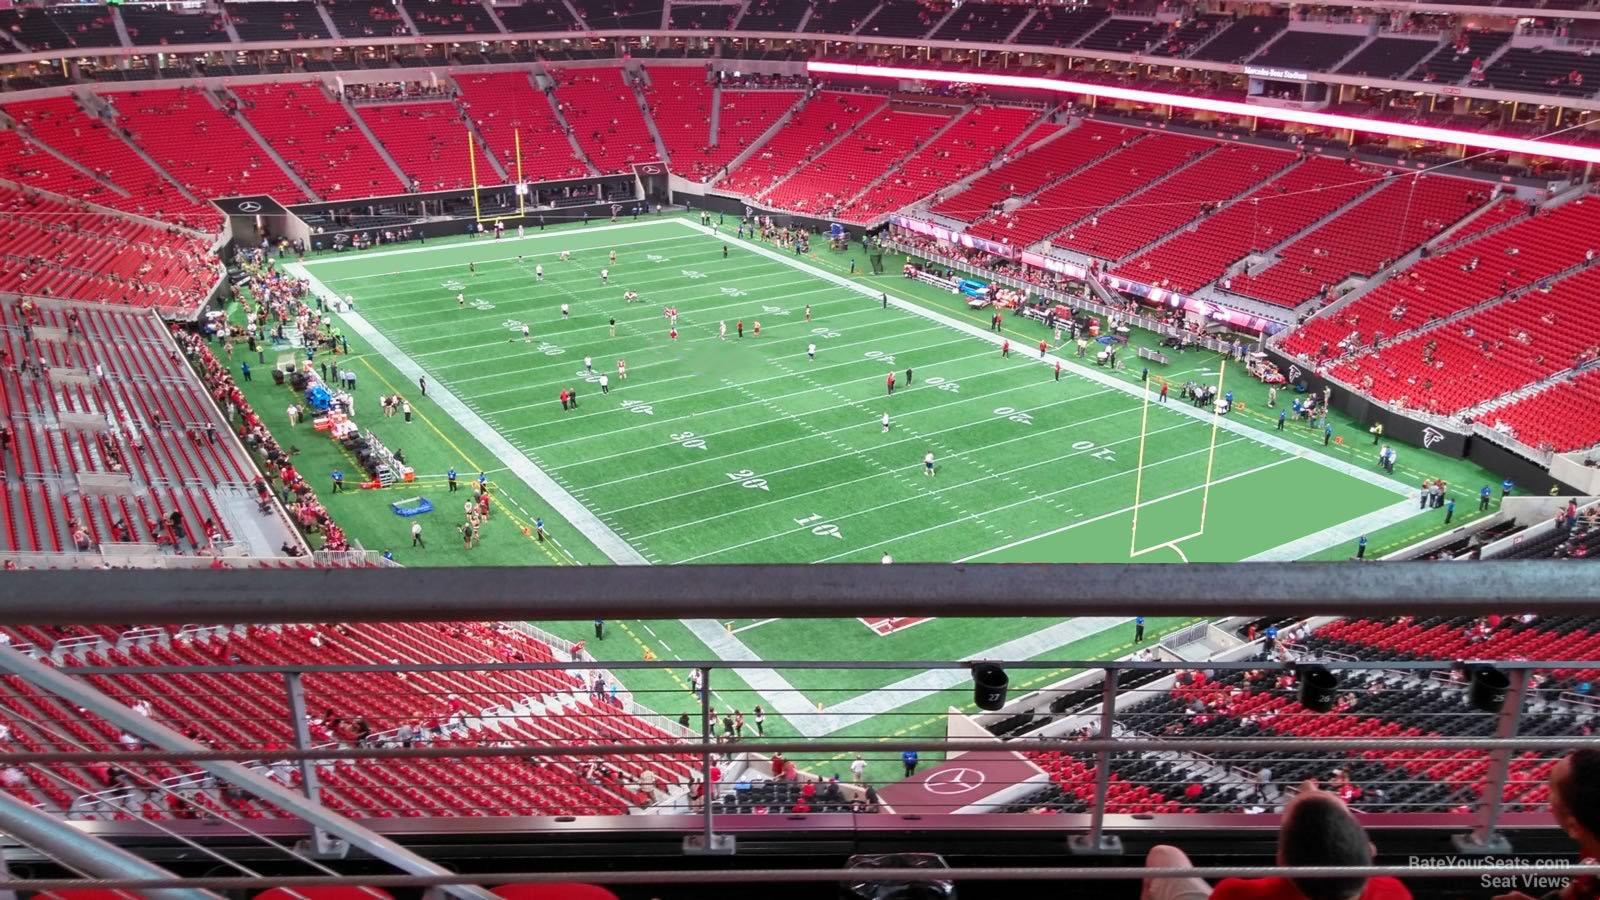 Mercedes benz stadium section 302 atlanta falcons for Mercedes benz stadium seat view